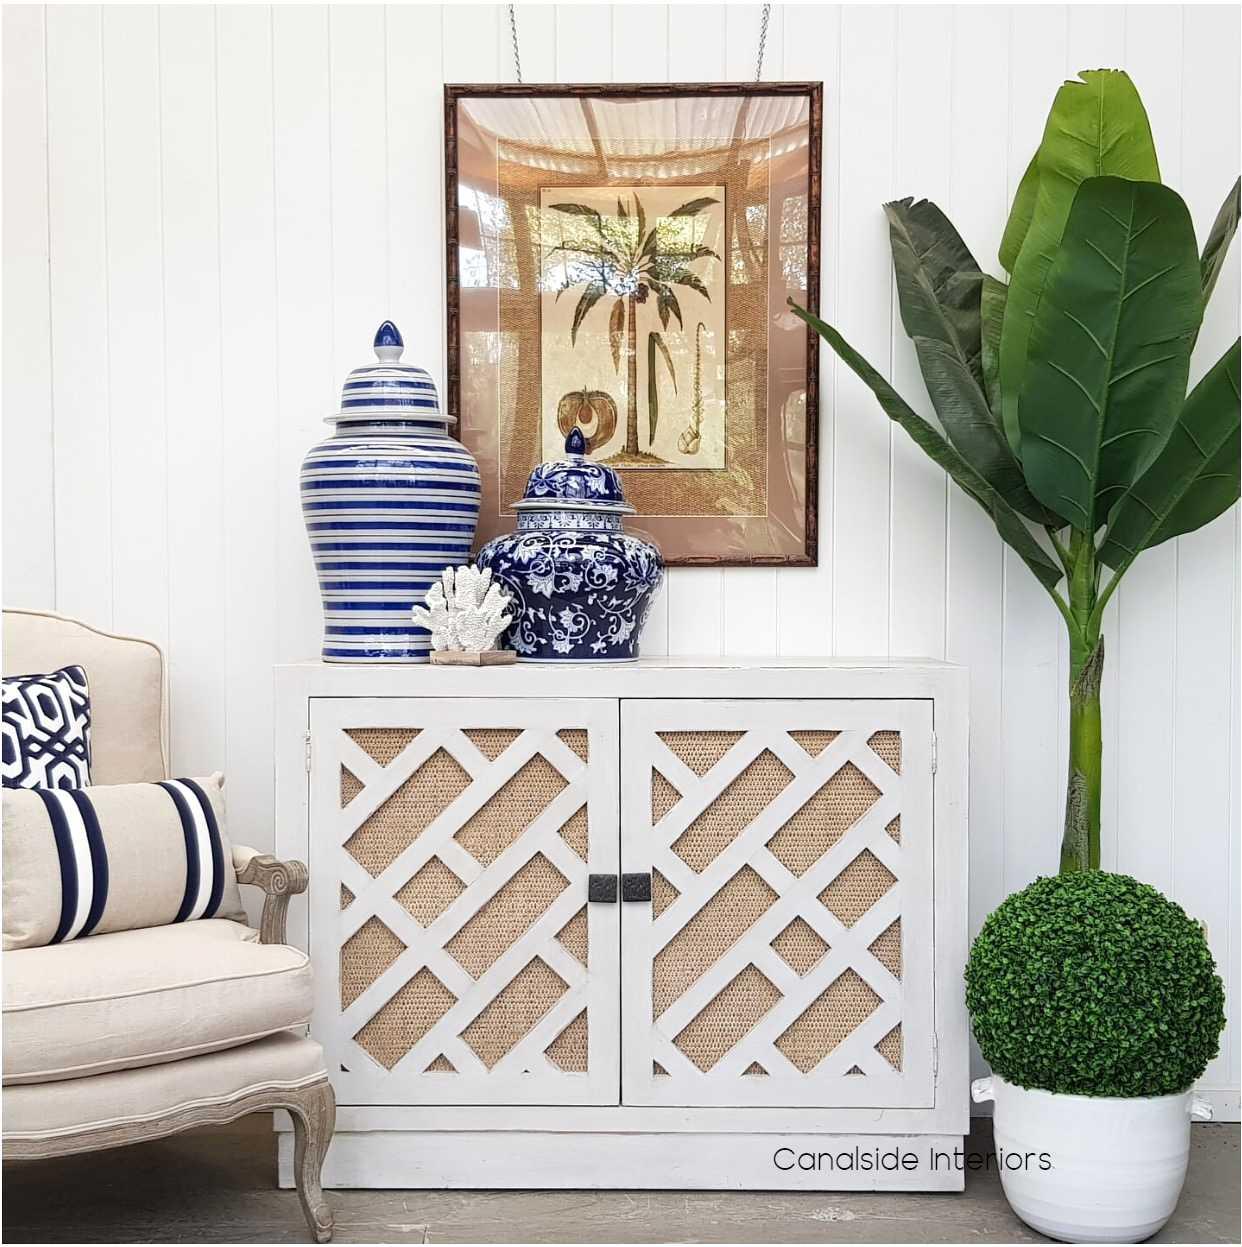 Brielle Botanica Sideboard  HAMPTONS Style, PLANTATION Style, LIVING Room, LIVING TV Media & Storage, TABLES Sideboards & Buffets, STORAGE, STORAGE Sideboards & Buffets, PLANTATION STYLE